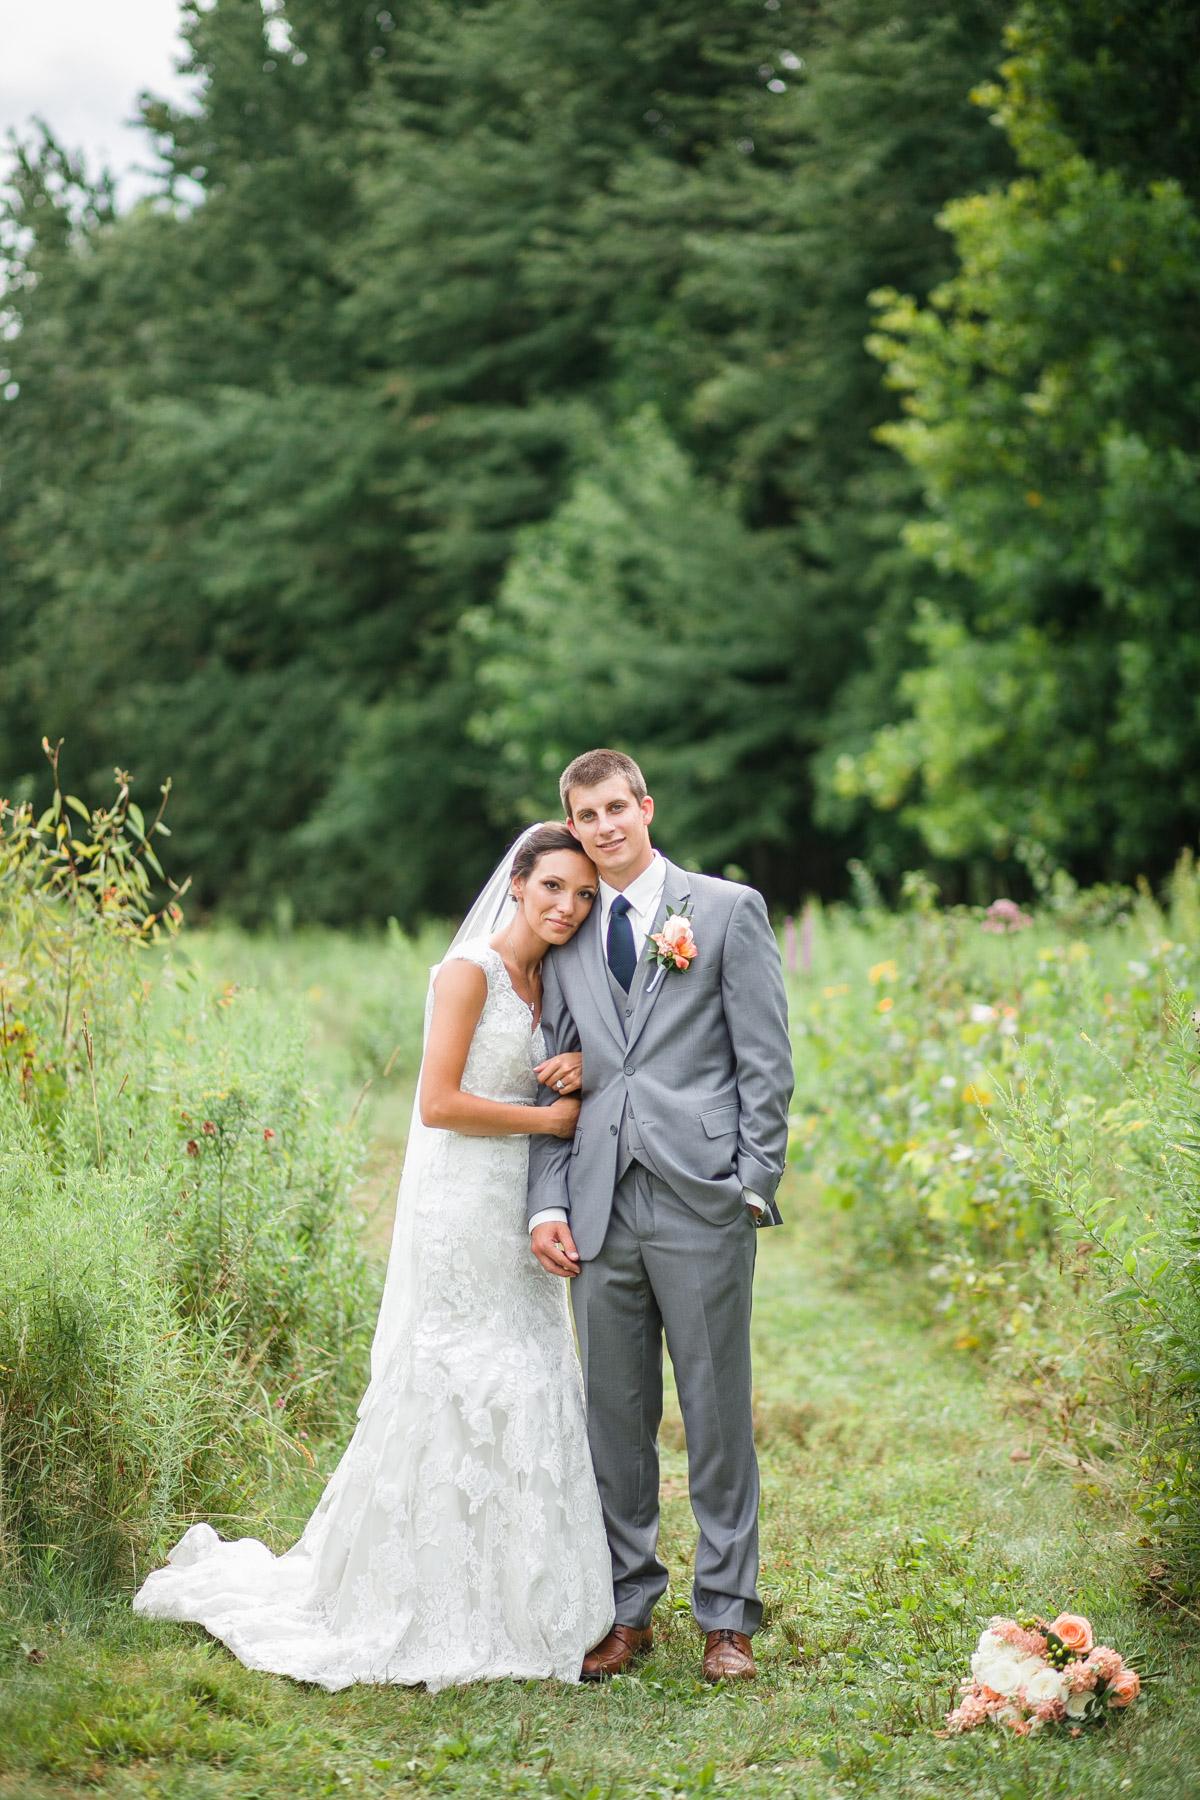 wildwood-park-wedding-photos-64.jpg